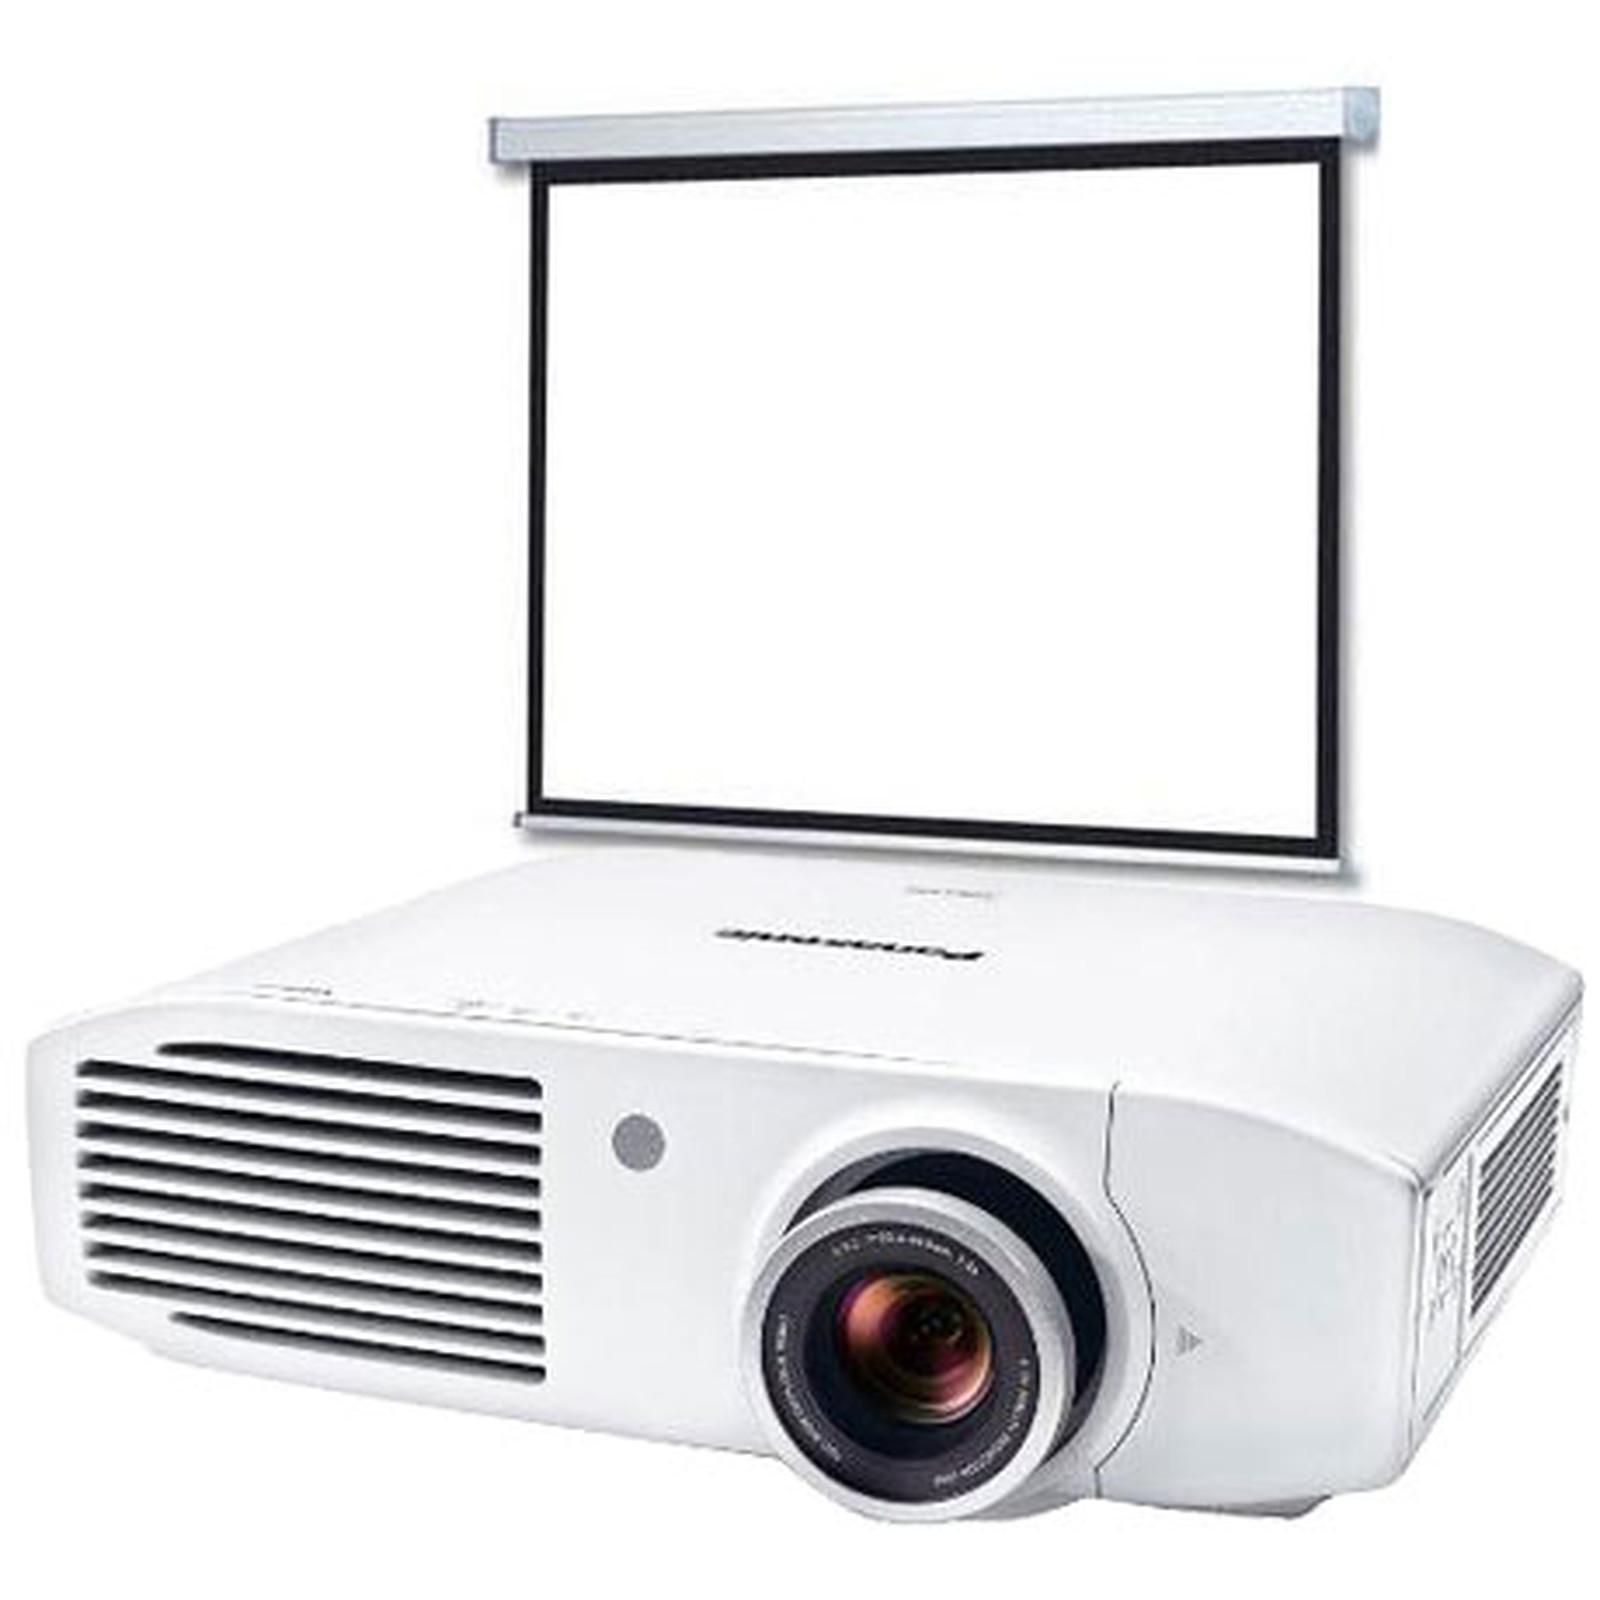 Panasonic PT-AH1000E + LDLC Ecran motorisé Format 16:9 - 240 x 135 cm